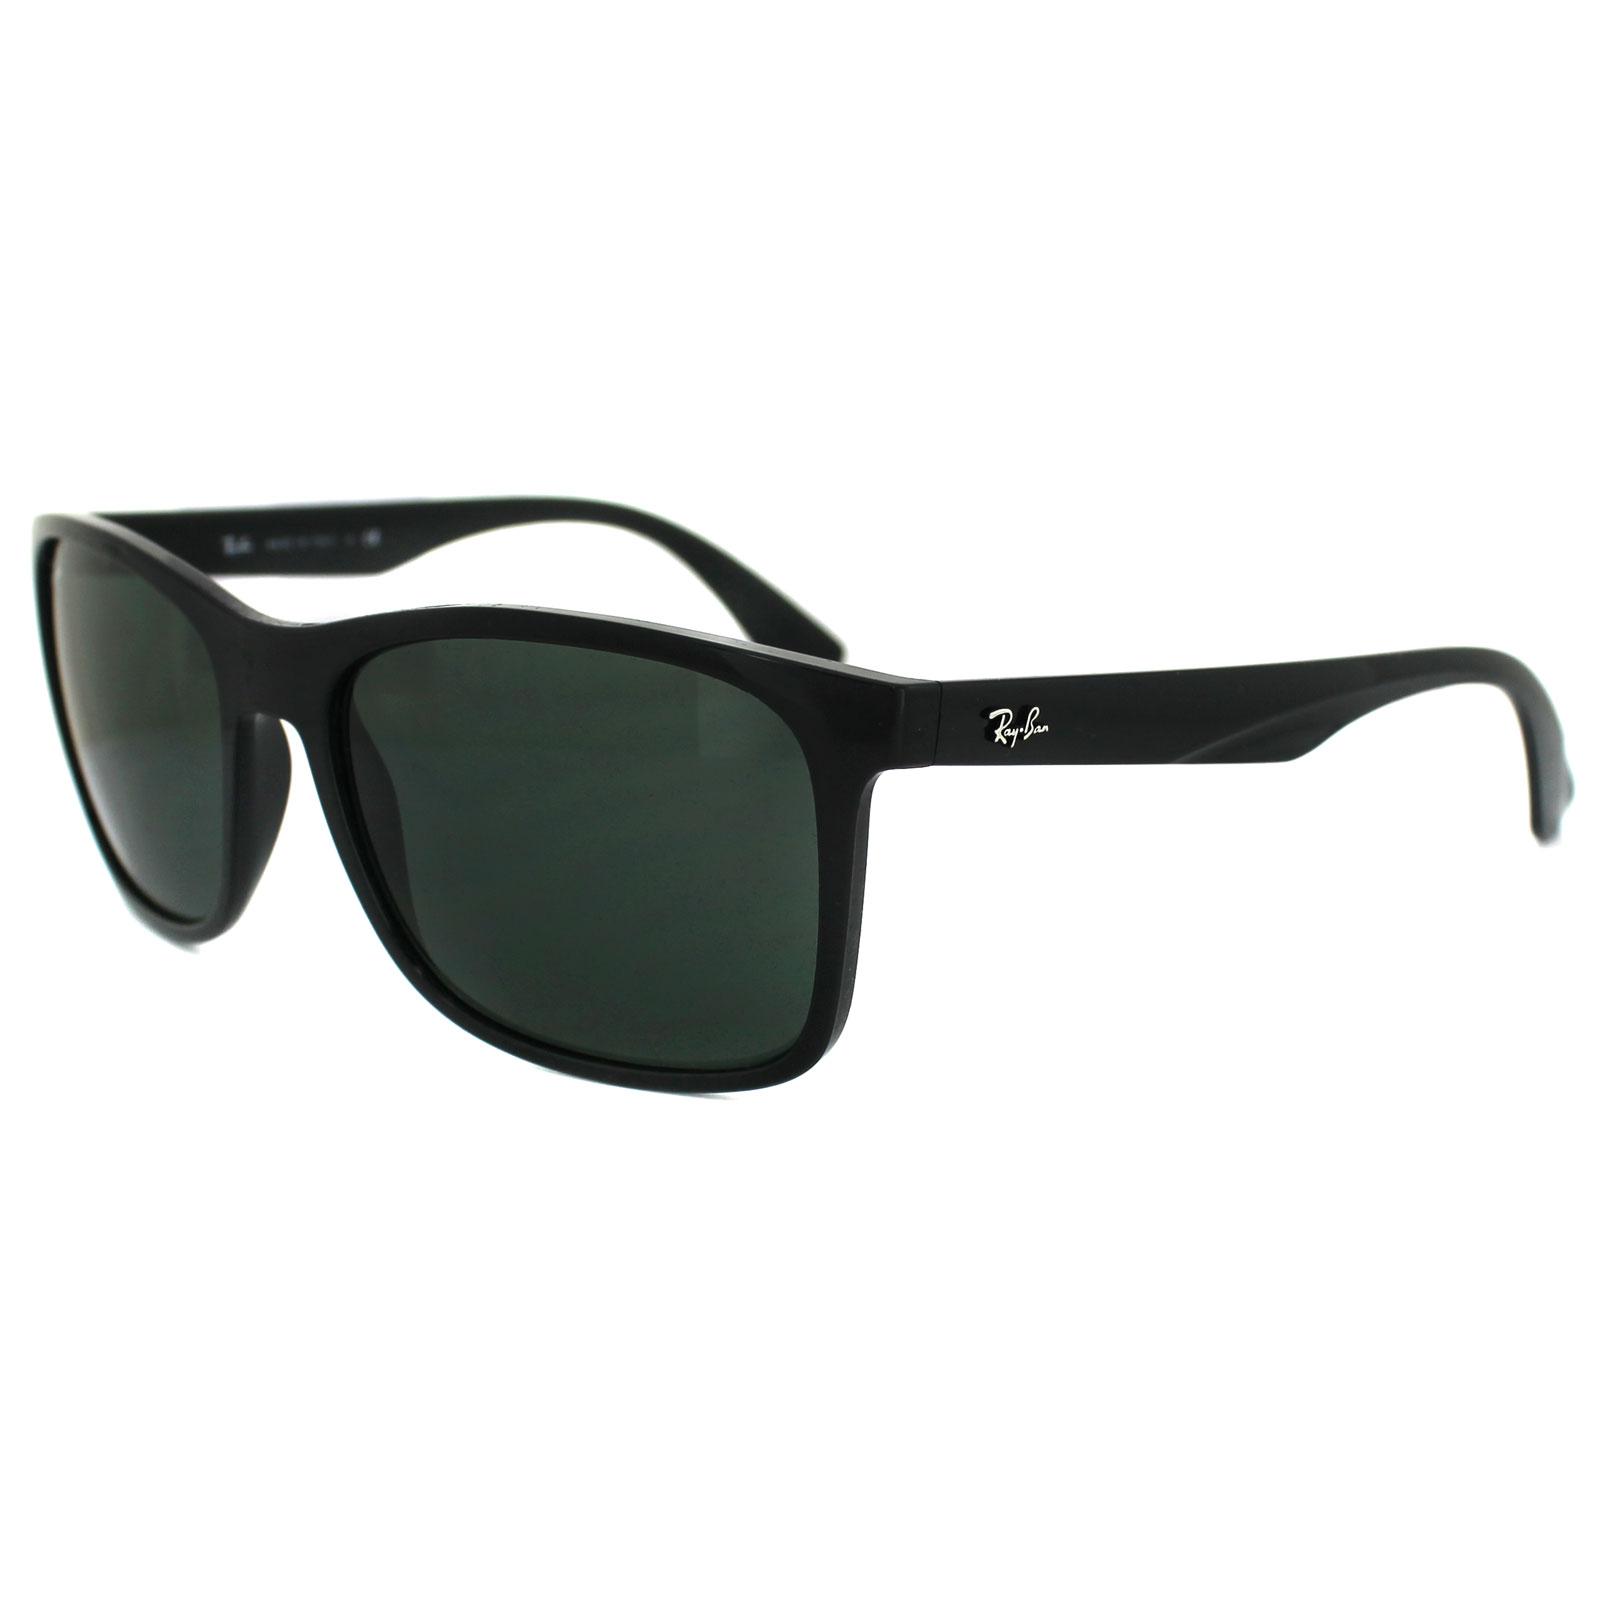 62d366cdce Sentinel Thumbnail 1. Sentinel Ray-Ban Sunglasses 4232 601 71 ...